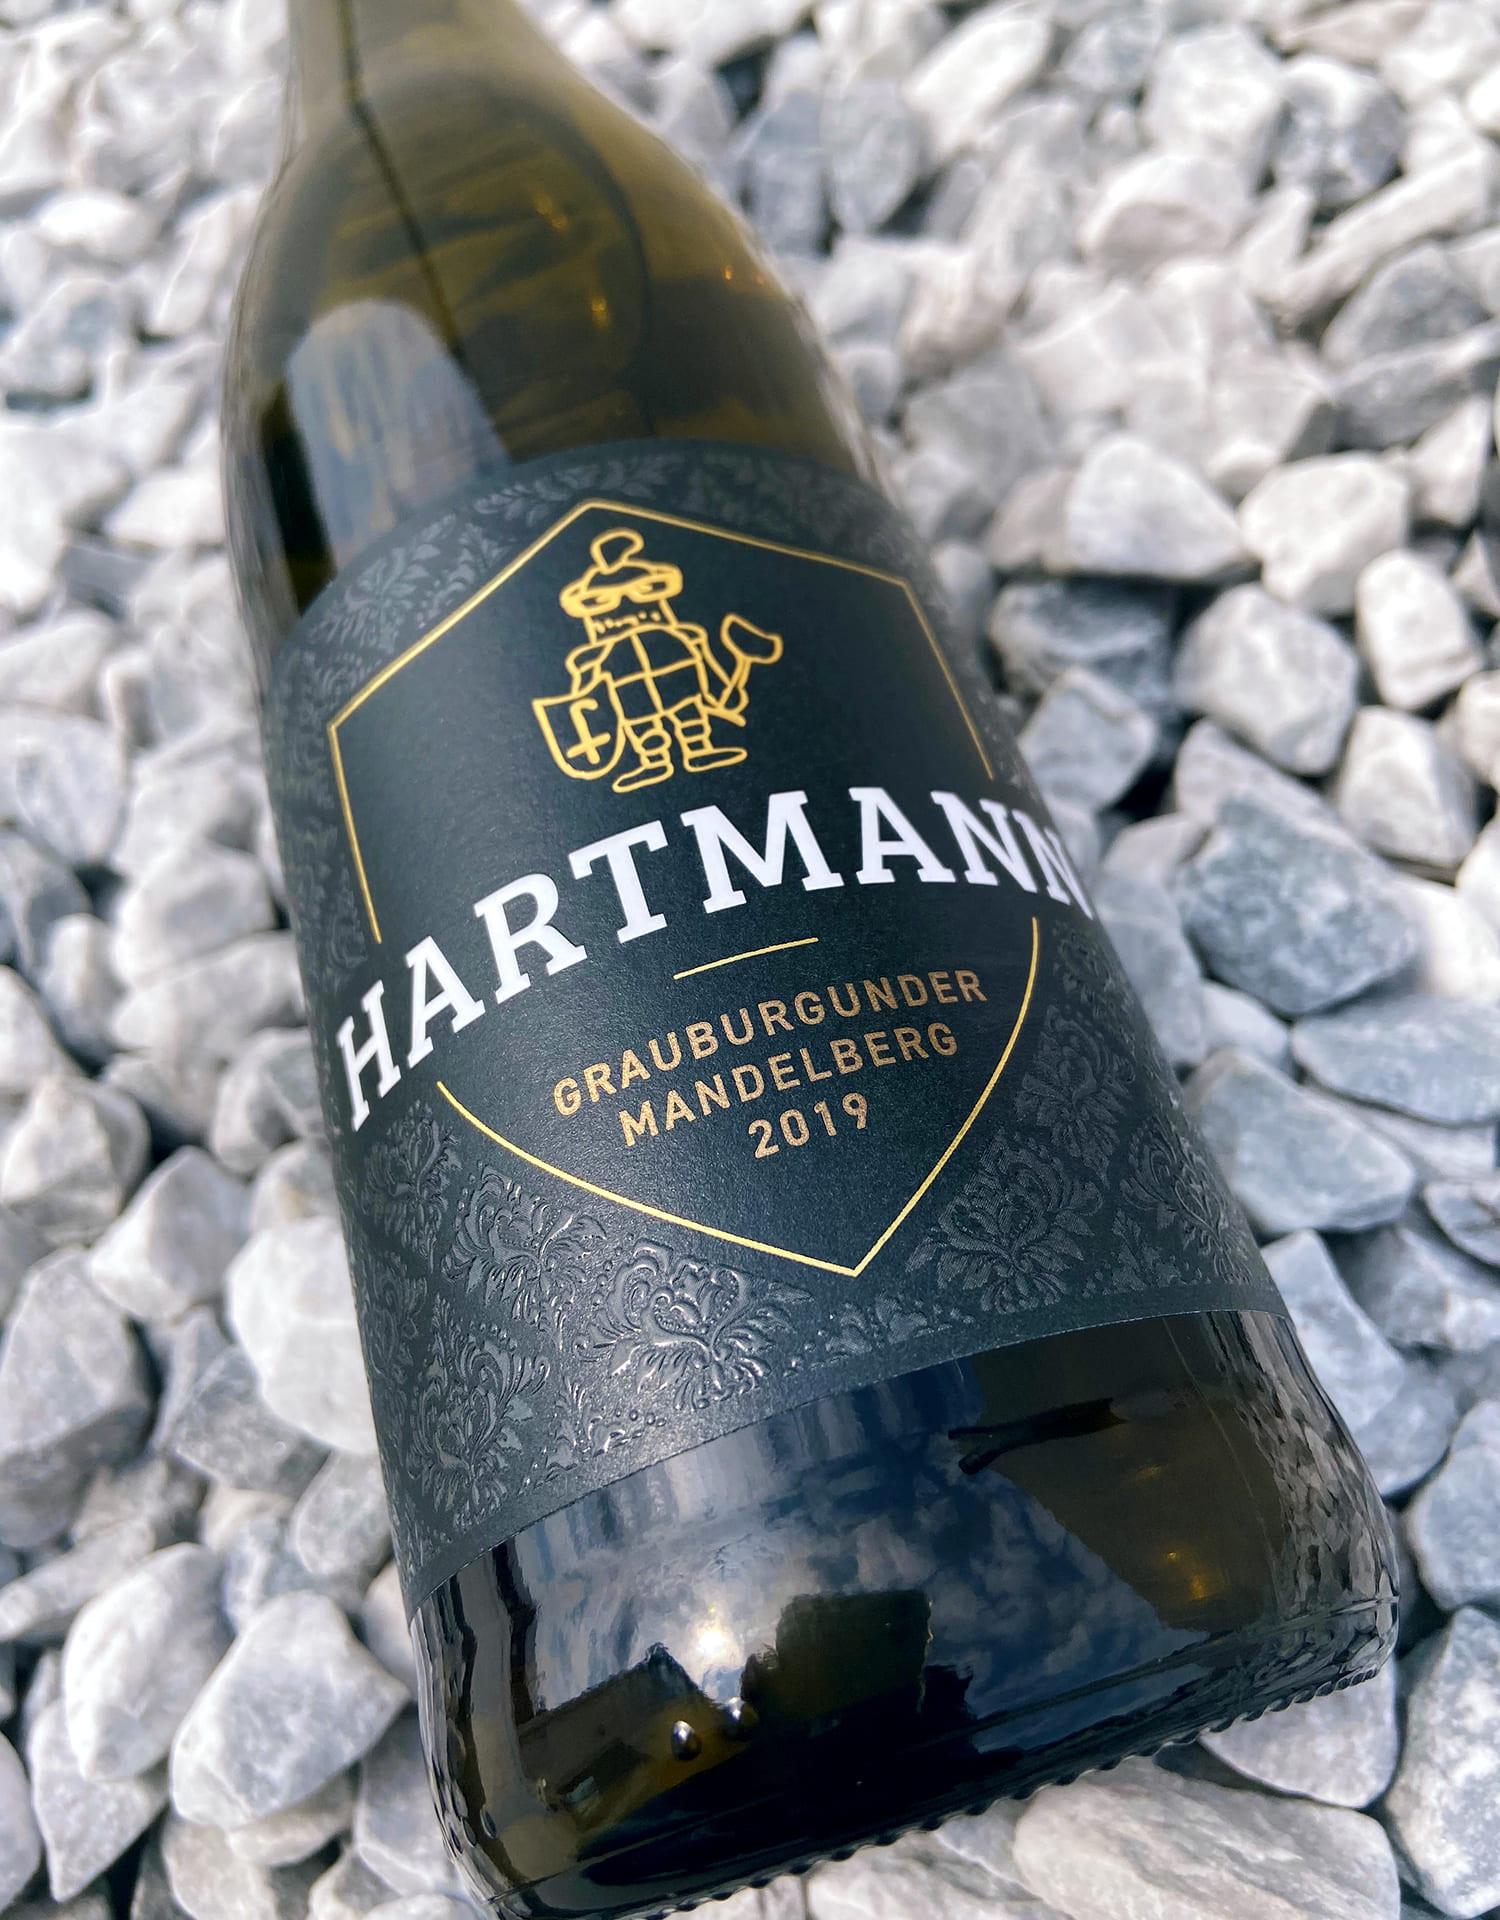 Hartmann_Etiktten_02.jpg